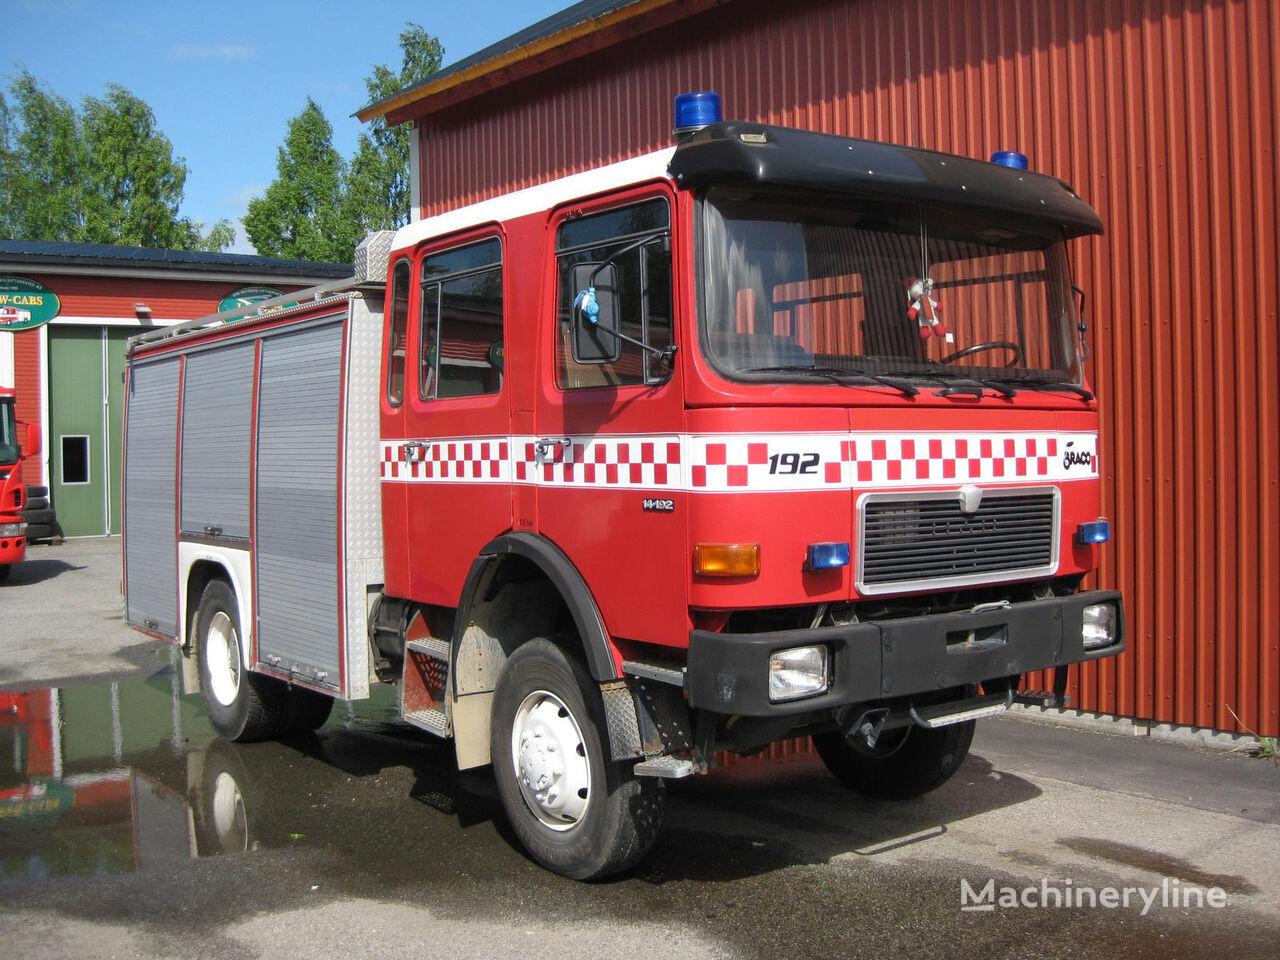 vatrogasno vozilo MAN 14-192, 4x4 WD